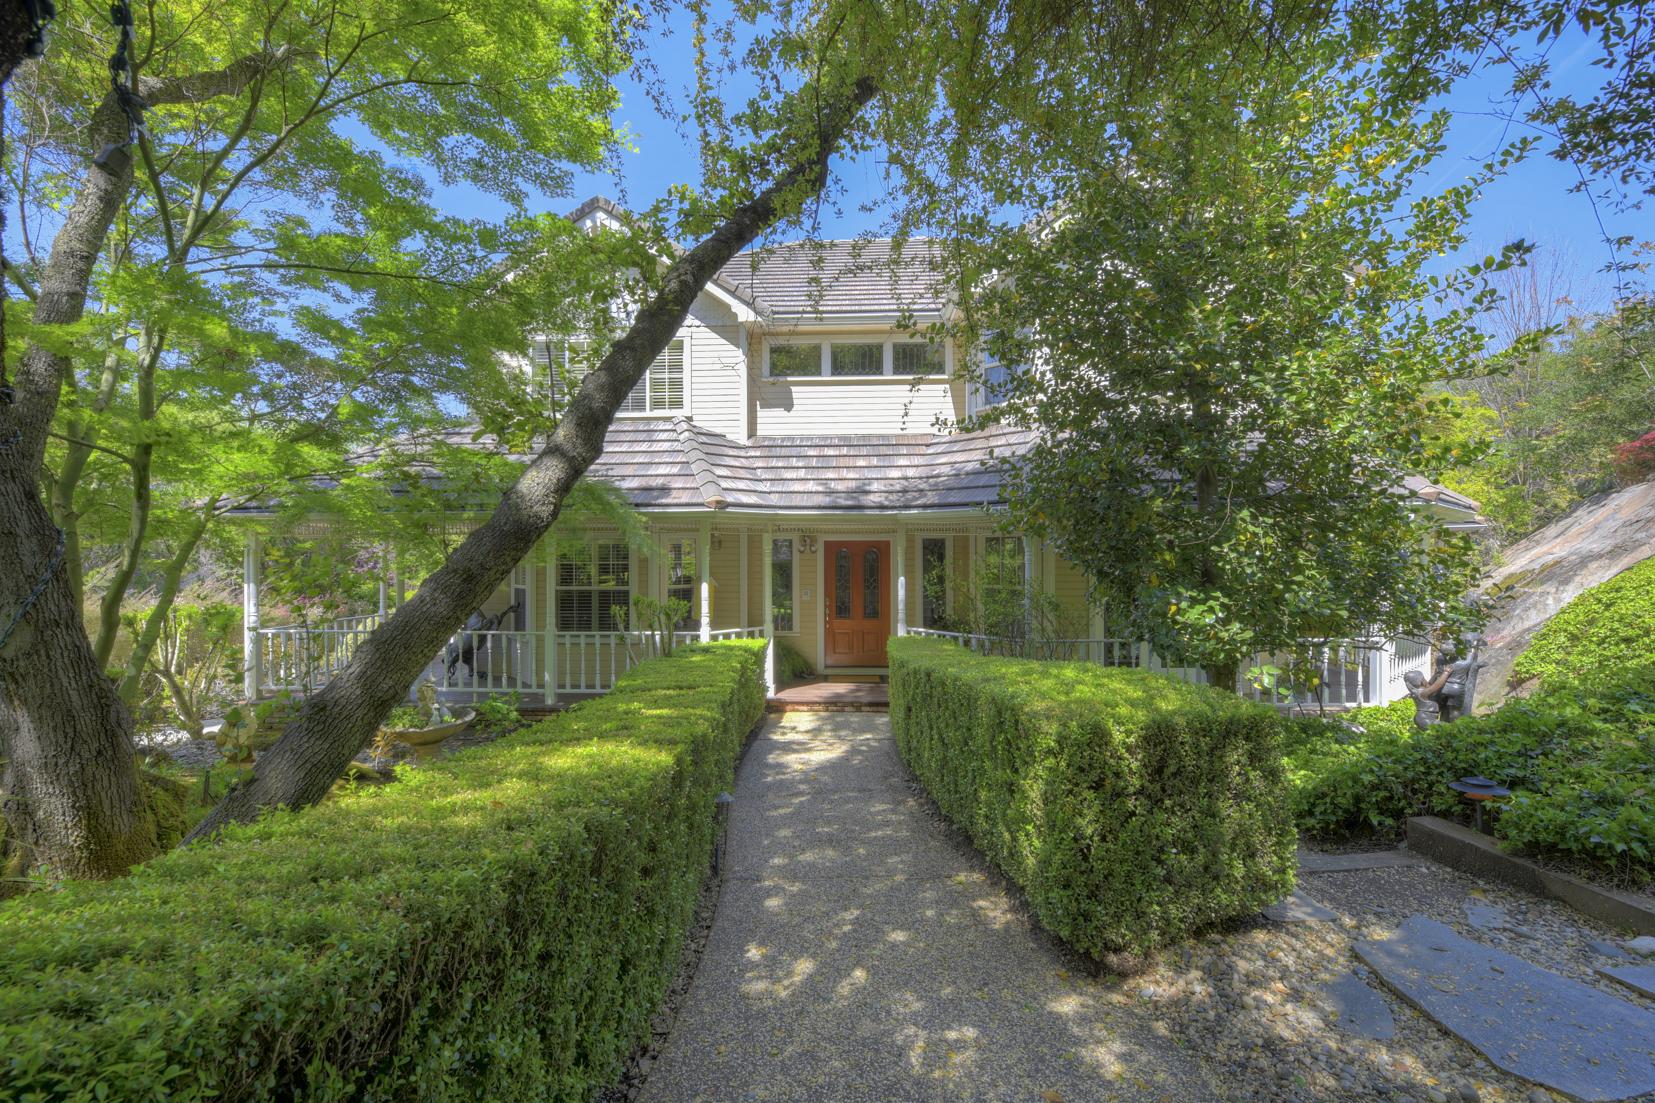 Single Family Home for Sale at 8940 Seville, Granite Bay, CA 95746 Granite Bay, California 95746 United States